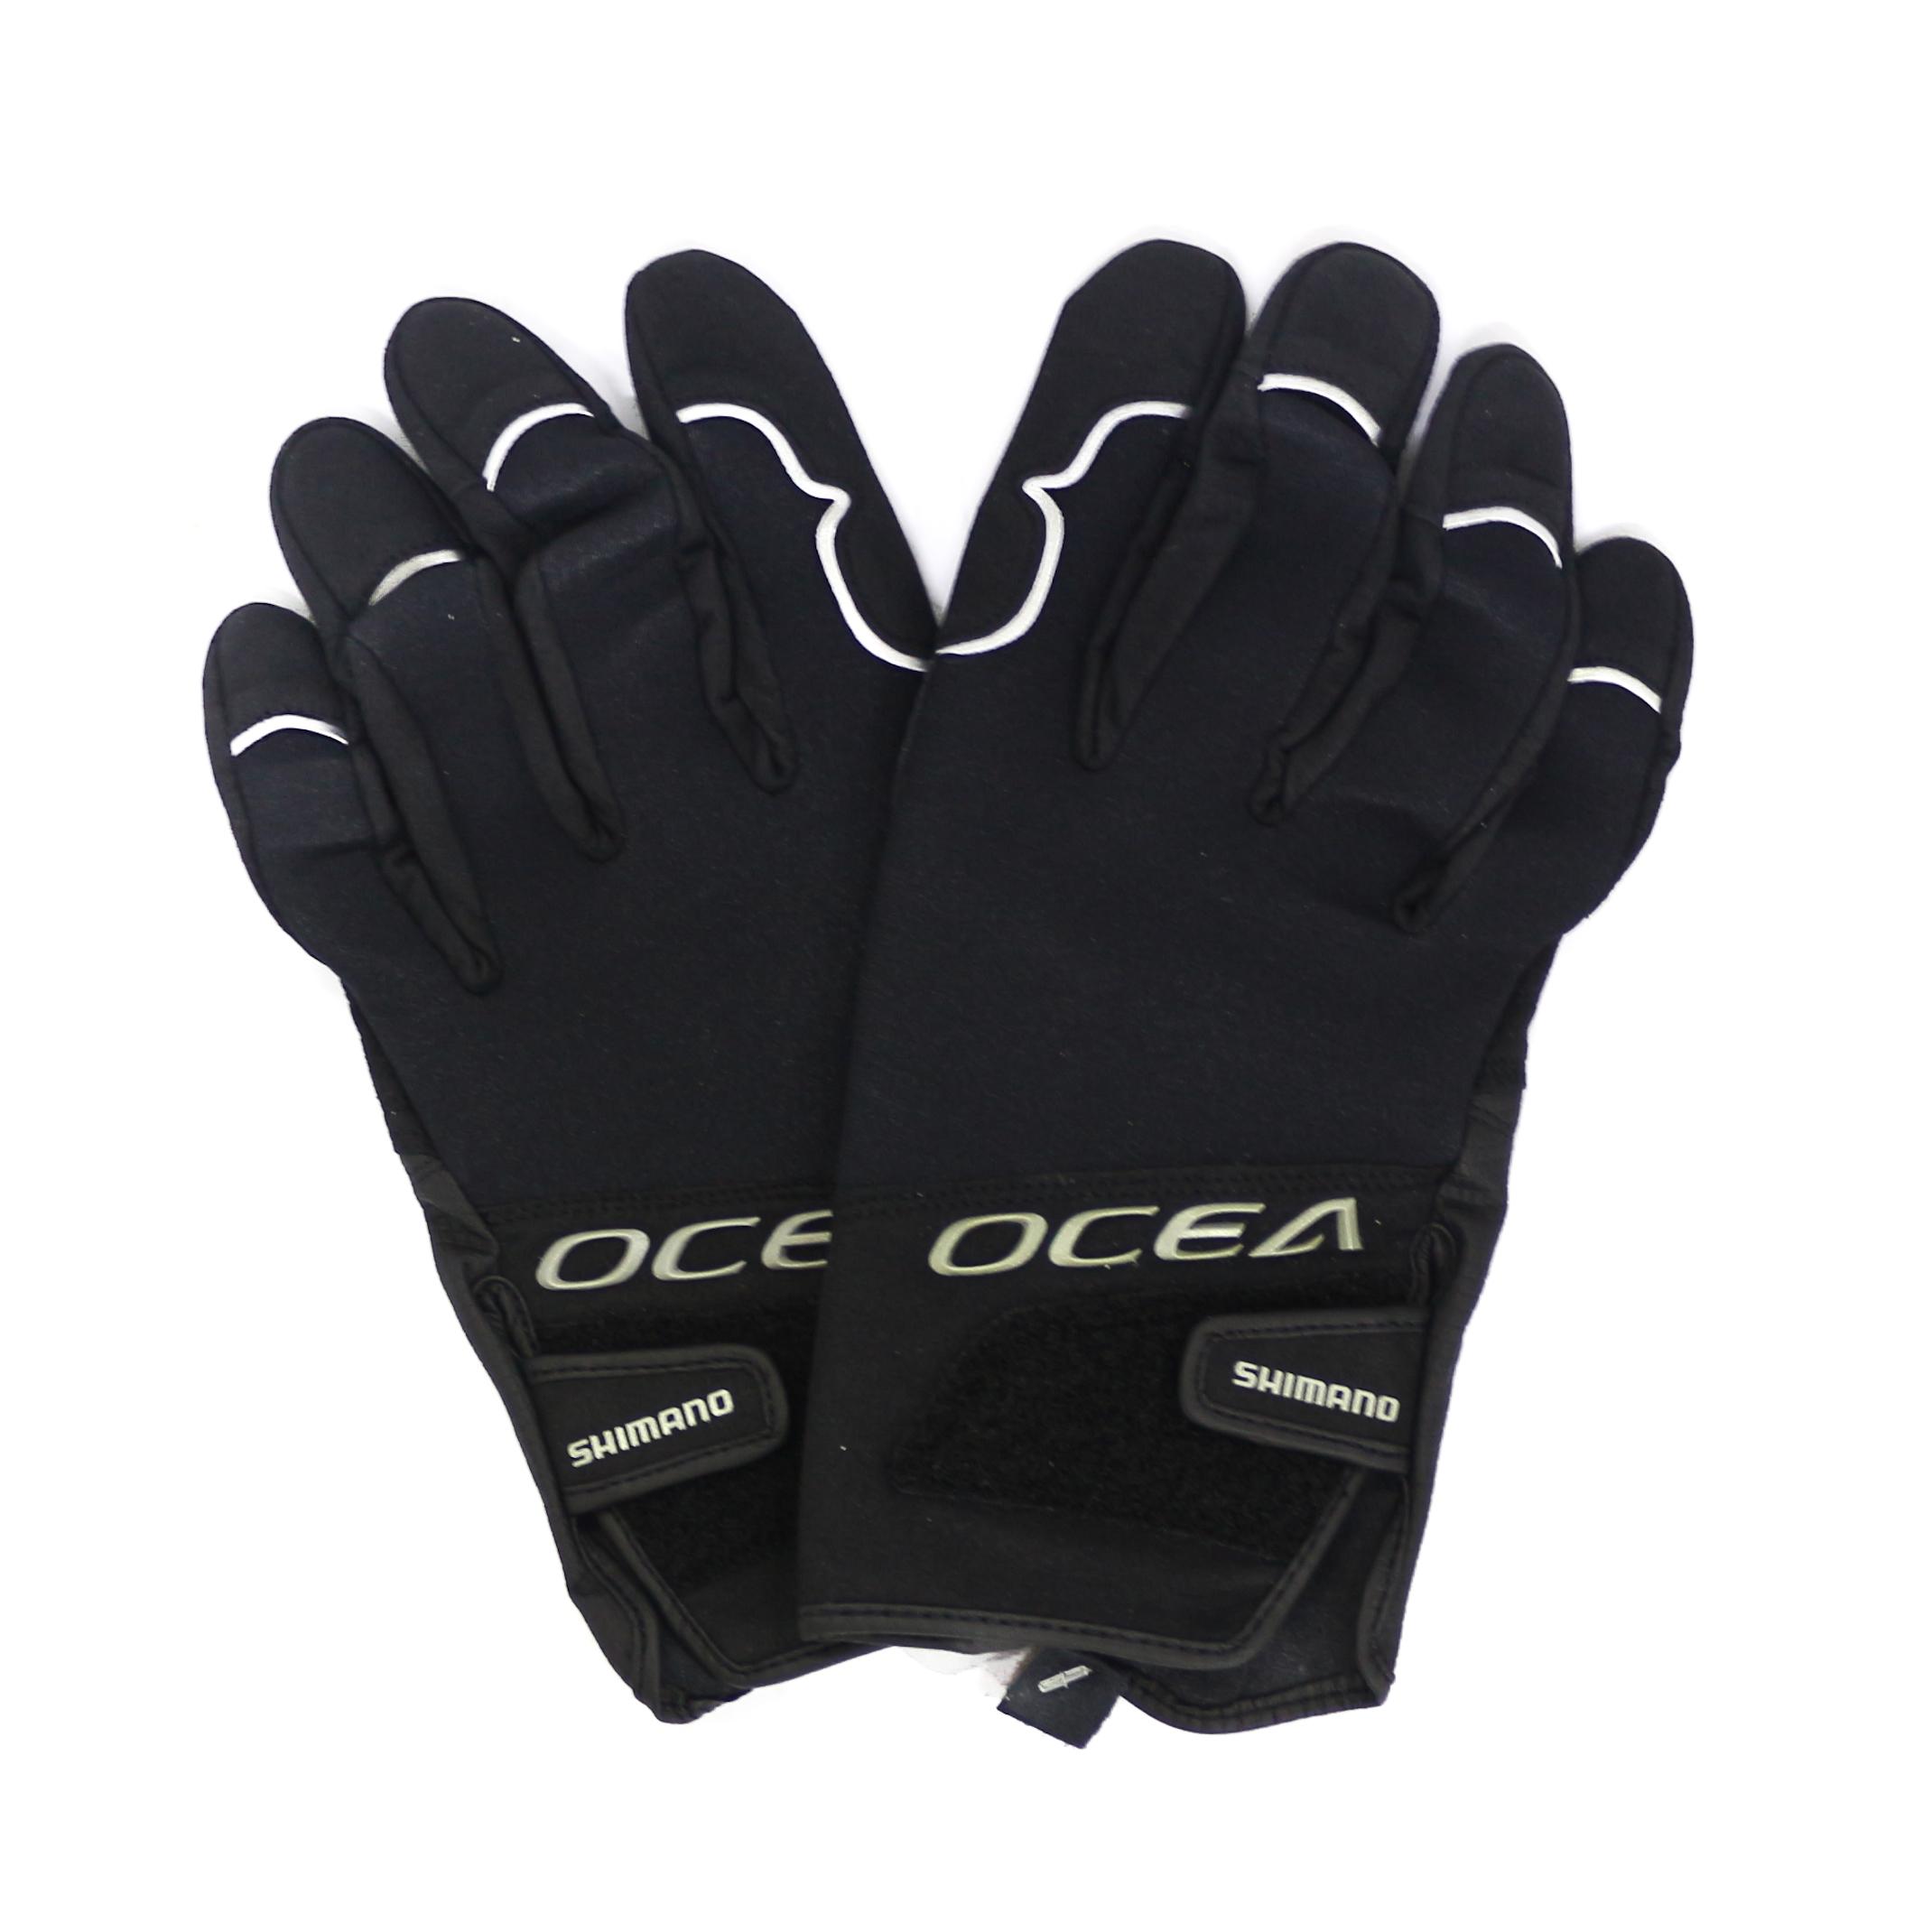 Shimano GL-295Q Gloves 3D Casting Titanium Black Size XL 532275